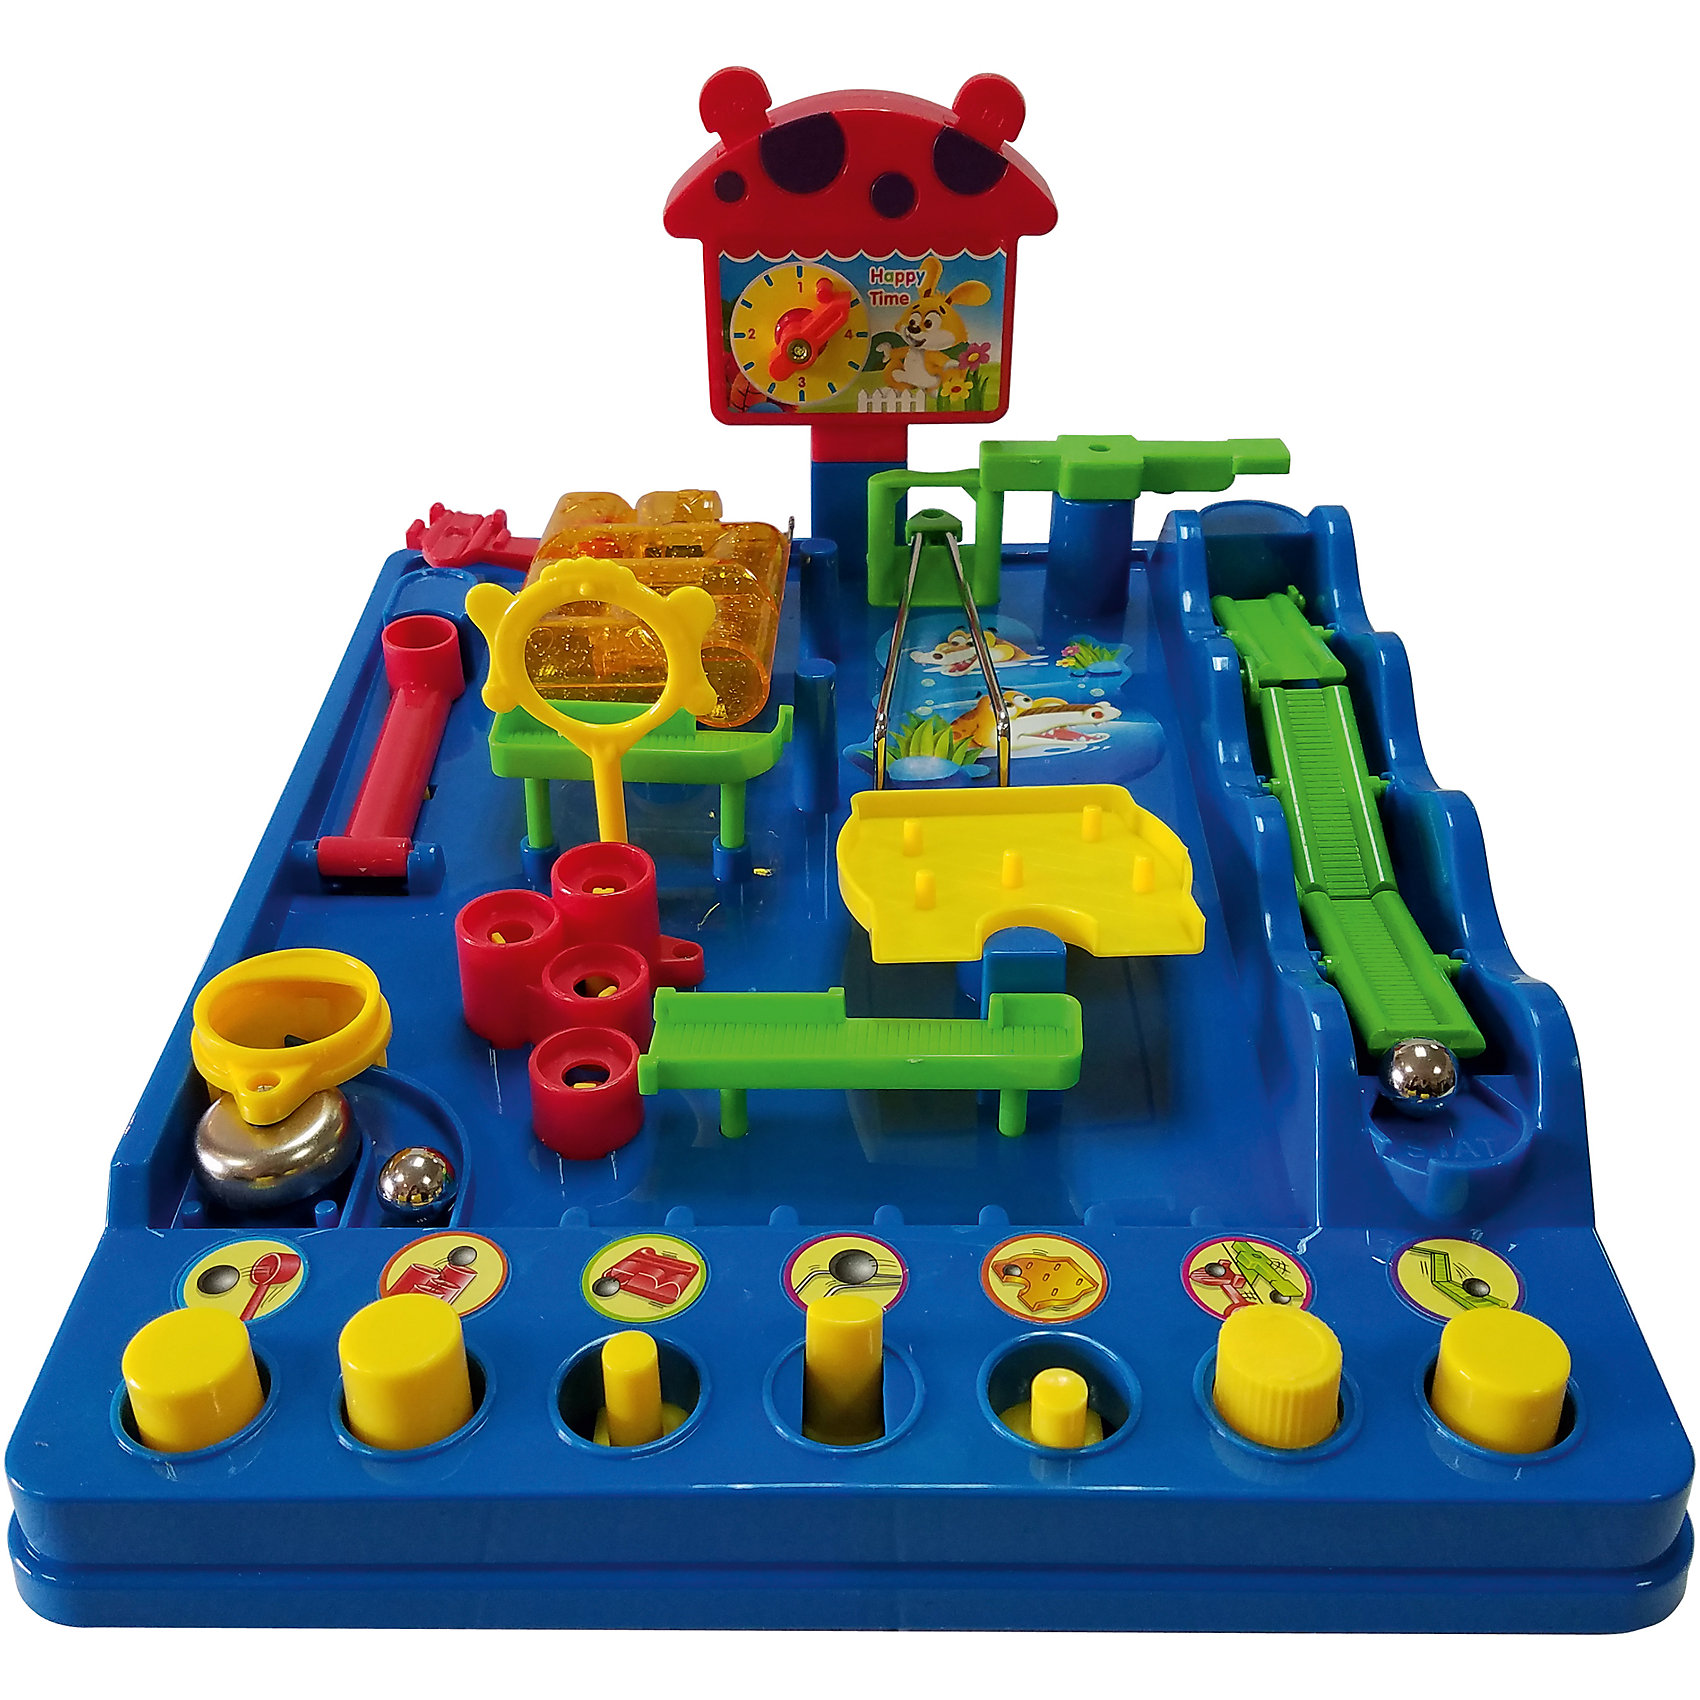 Игра Приключения шарика, Icoy ToysНастольные игры<br><br><br>Ширина мм: 270<br>Глубина мм: 340<br>Высота мм: 100<br>Вес г: 1017<br>Возраст от месяцев: 36<br>Возраст до месяцев: 168<br>Пол: Унисекс<br>Возраст: Детский<br>SKU: 6883974